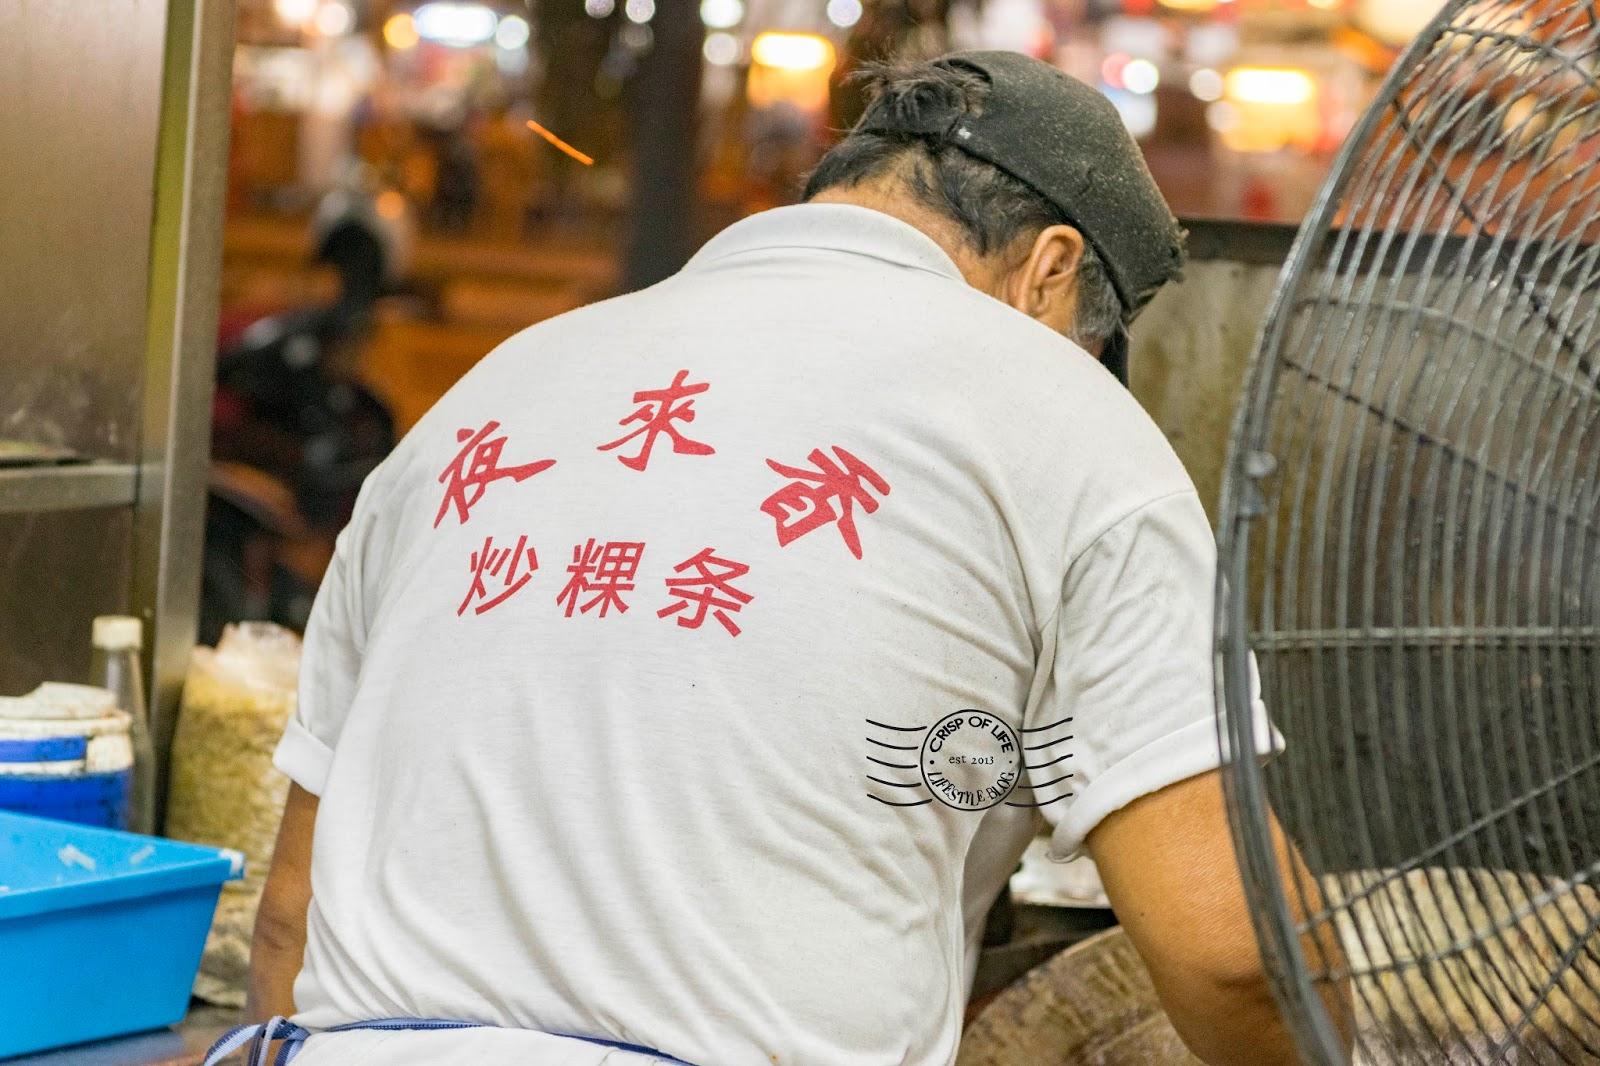 Ye Lai Xiang Char Koay Teow 夜来香炒粿条 @ Raja Uda, Penang